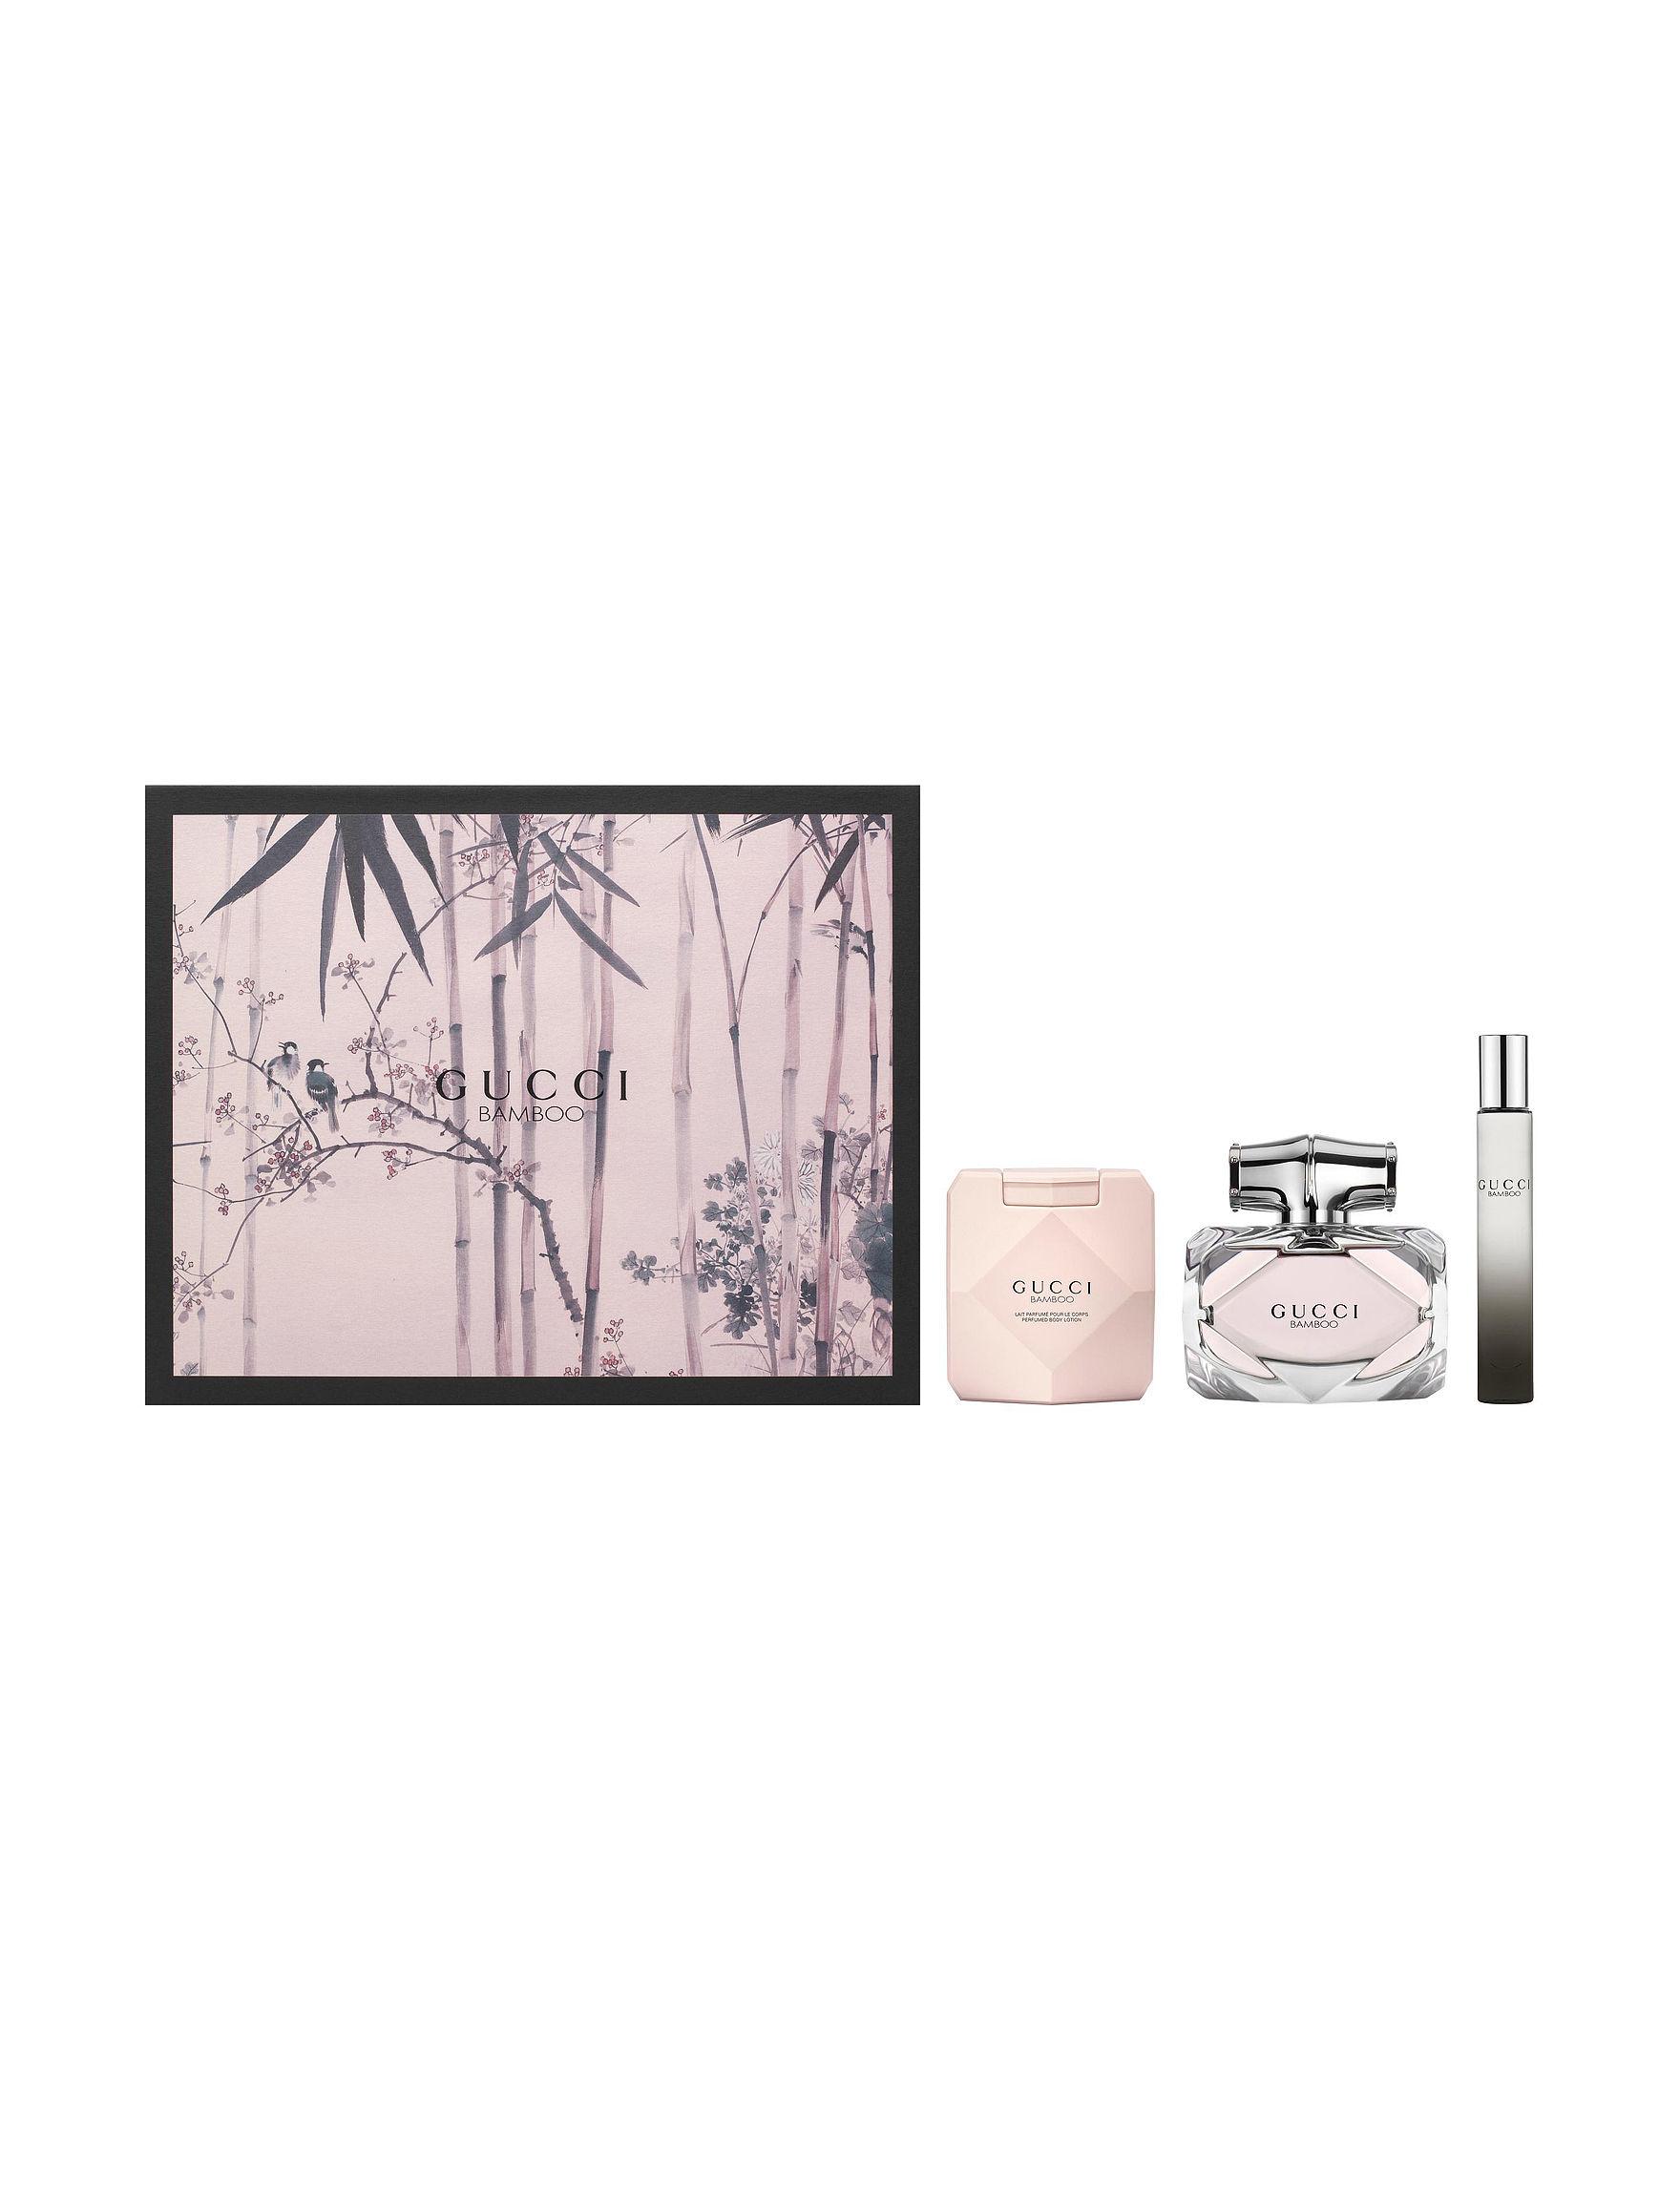 Gucci Multi Fragrance Gift Sets